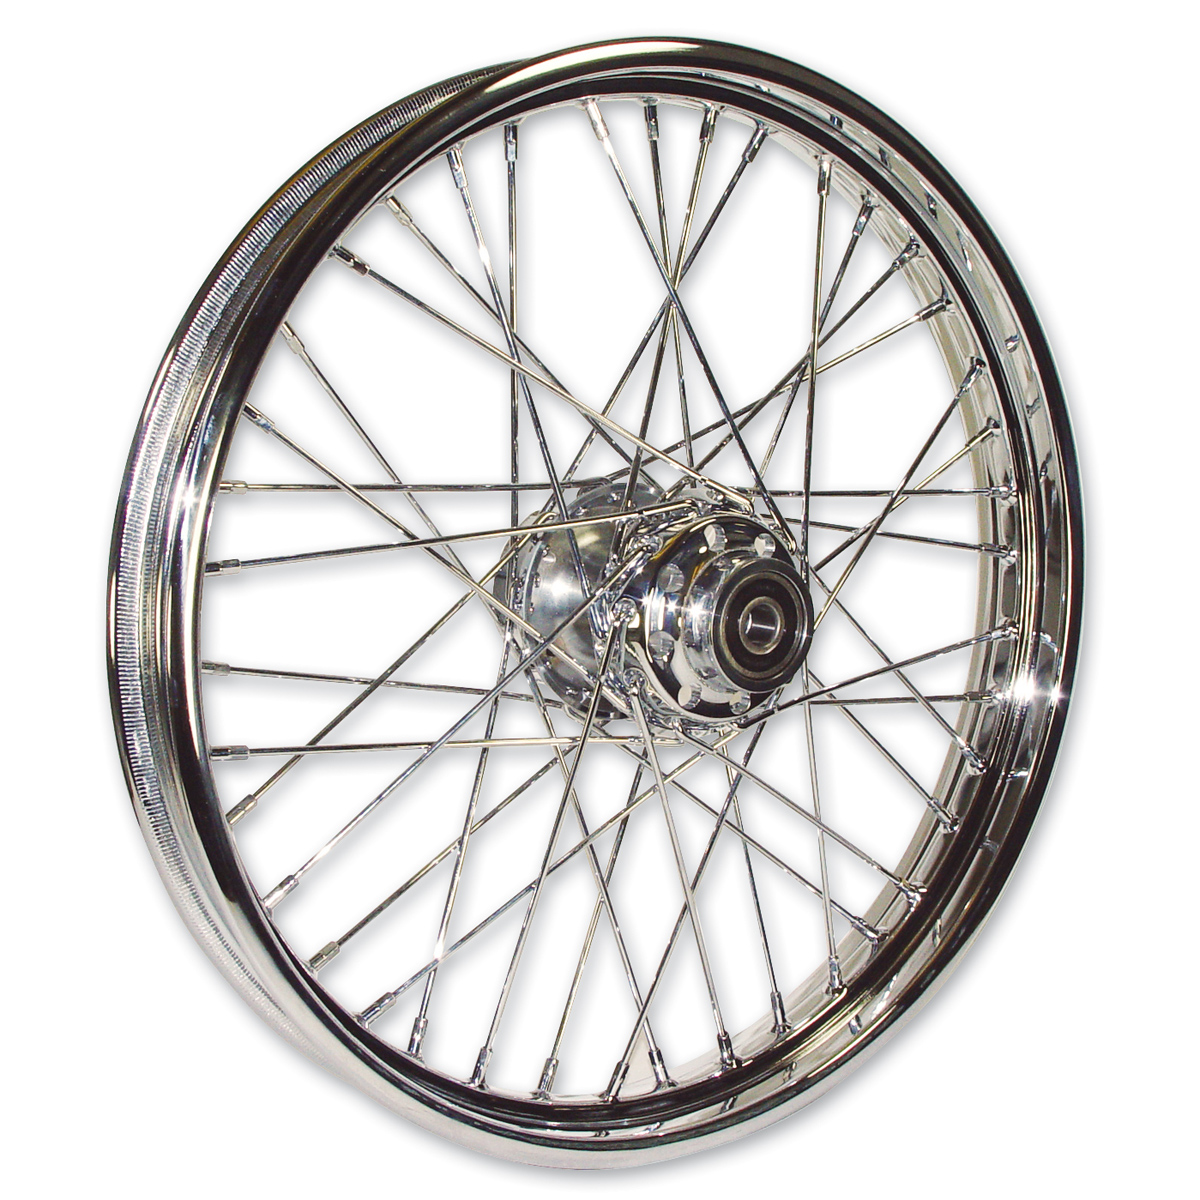 "Mid-USA Chrome Complete 40 Spoke Front Wheel 21 X 2.15"""